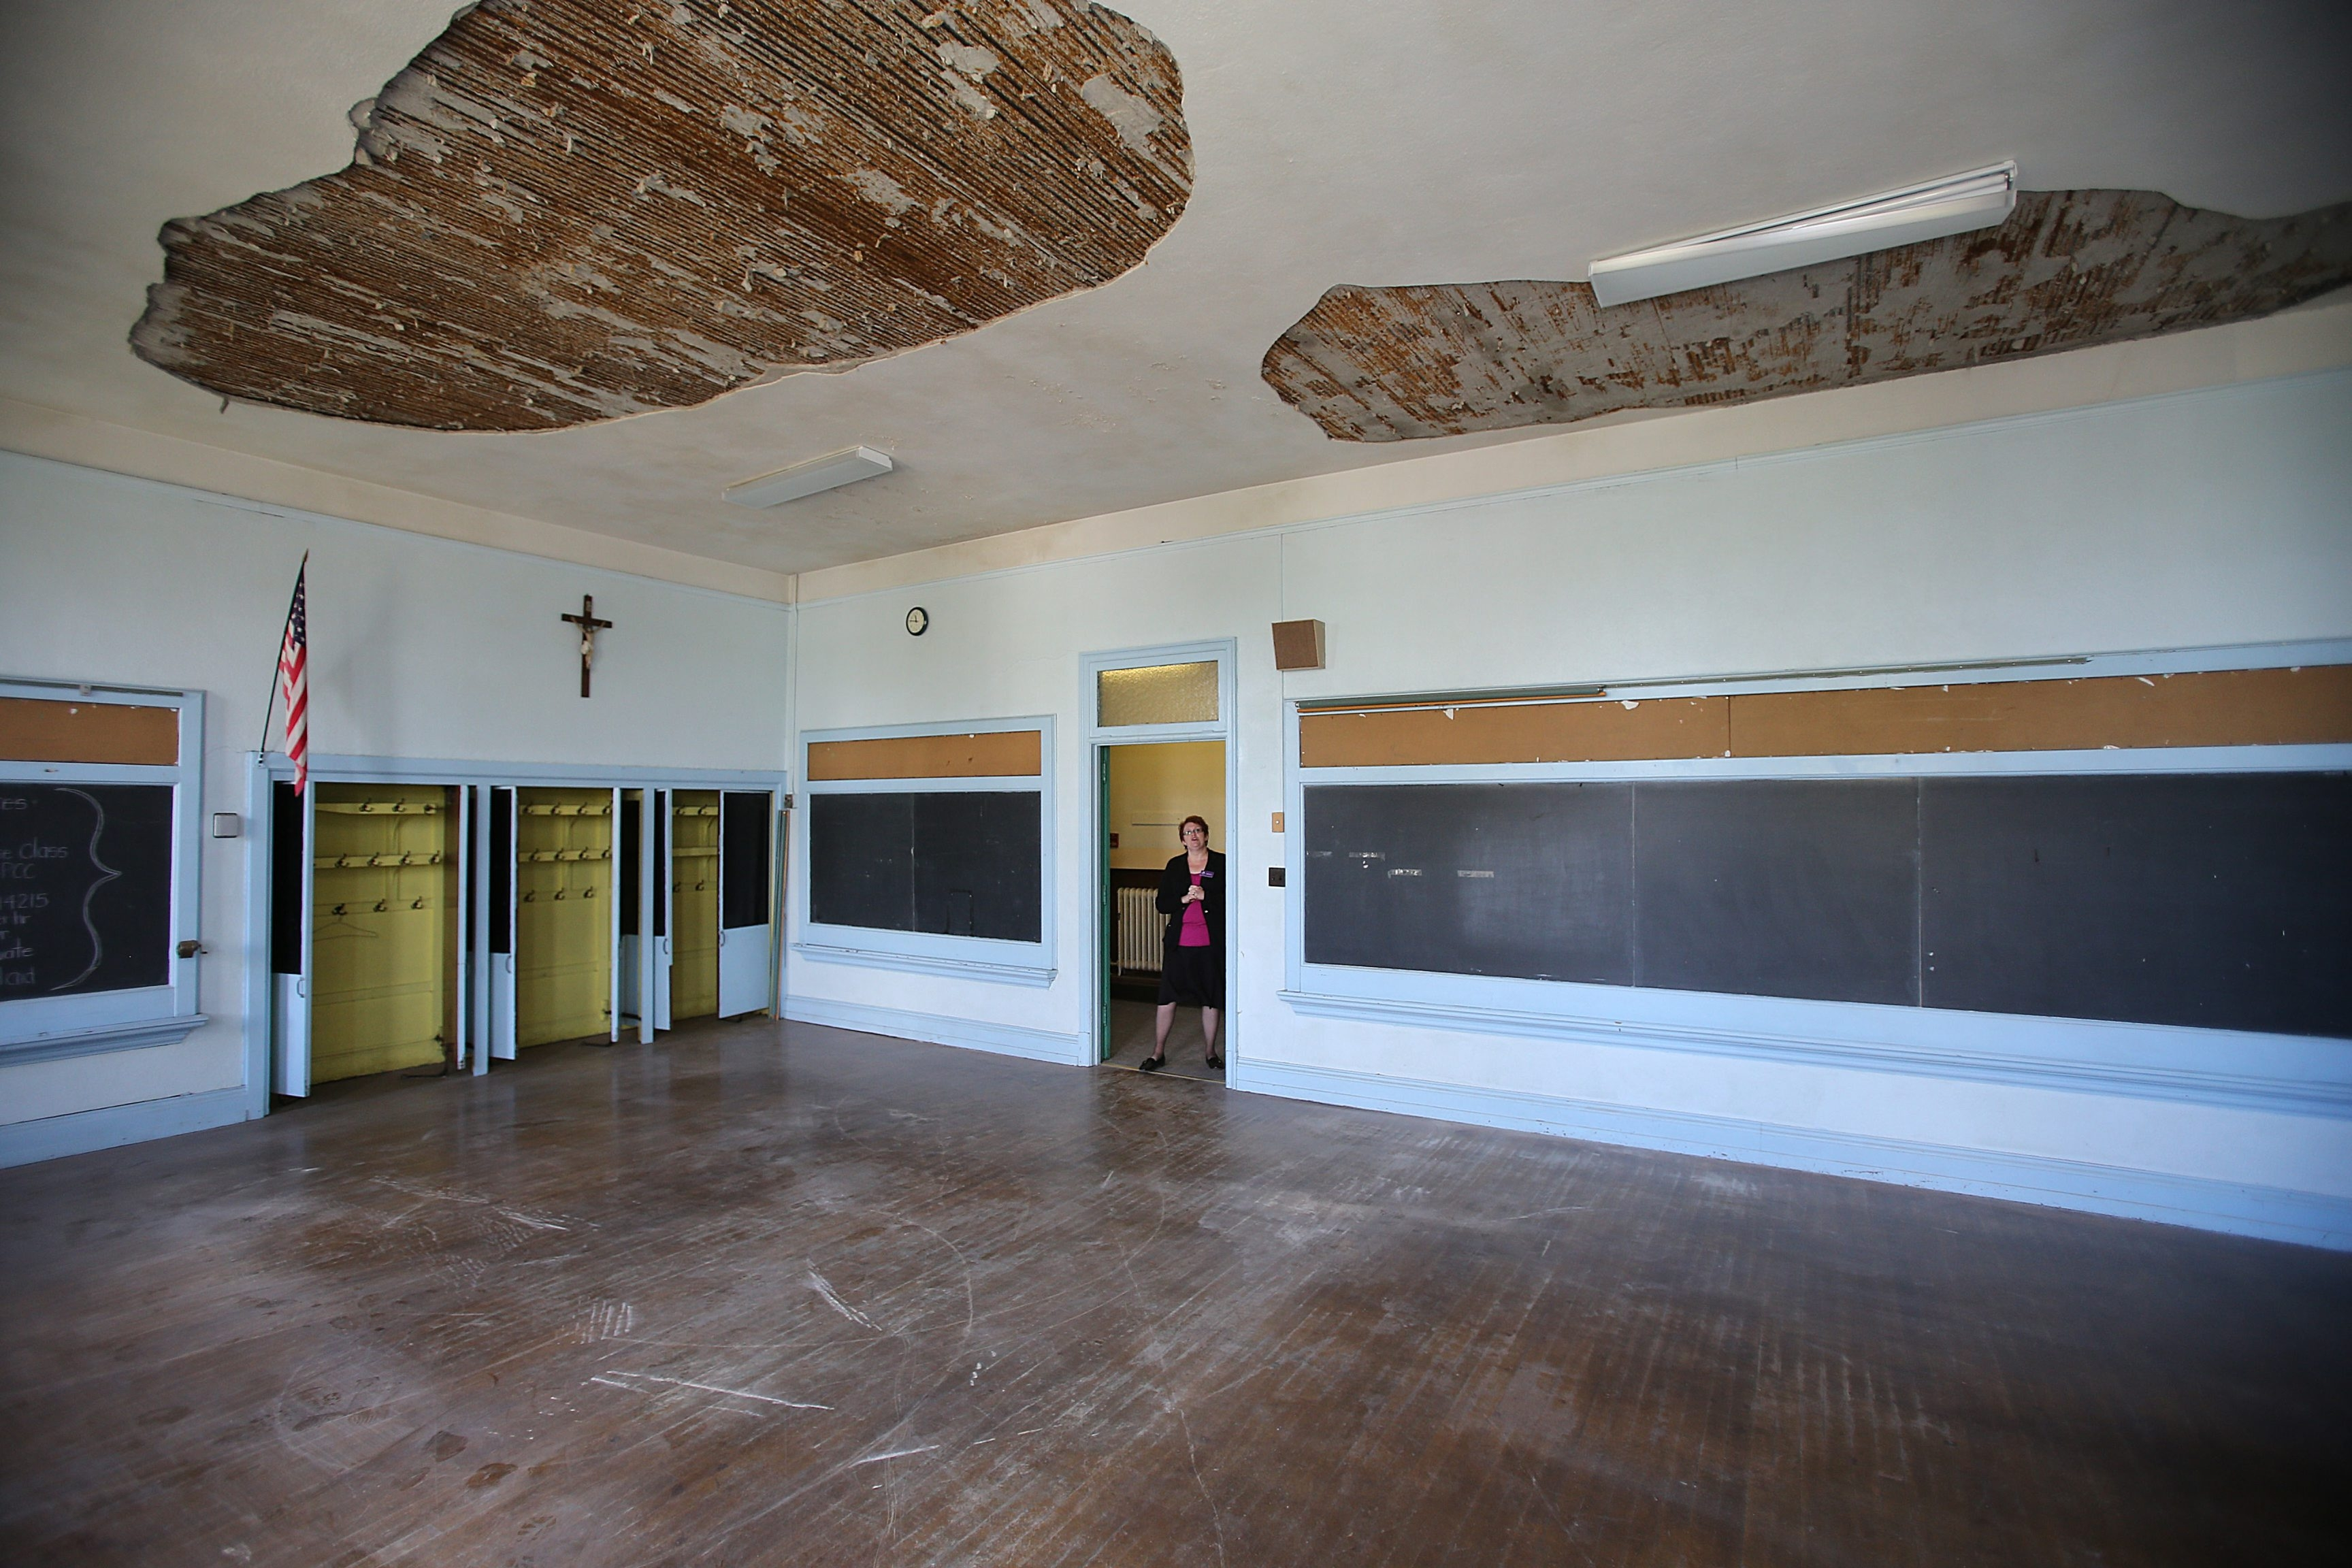 Charles Lewis/Buffalo News    Volunteer Kelli Cavo looks into a  vacant classroom Sunday in the former St. Gerard parish hall on Bailey Avenue.